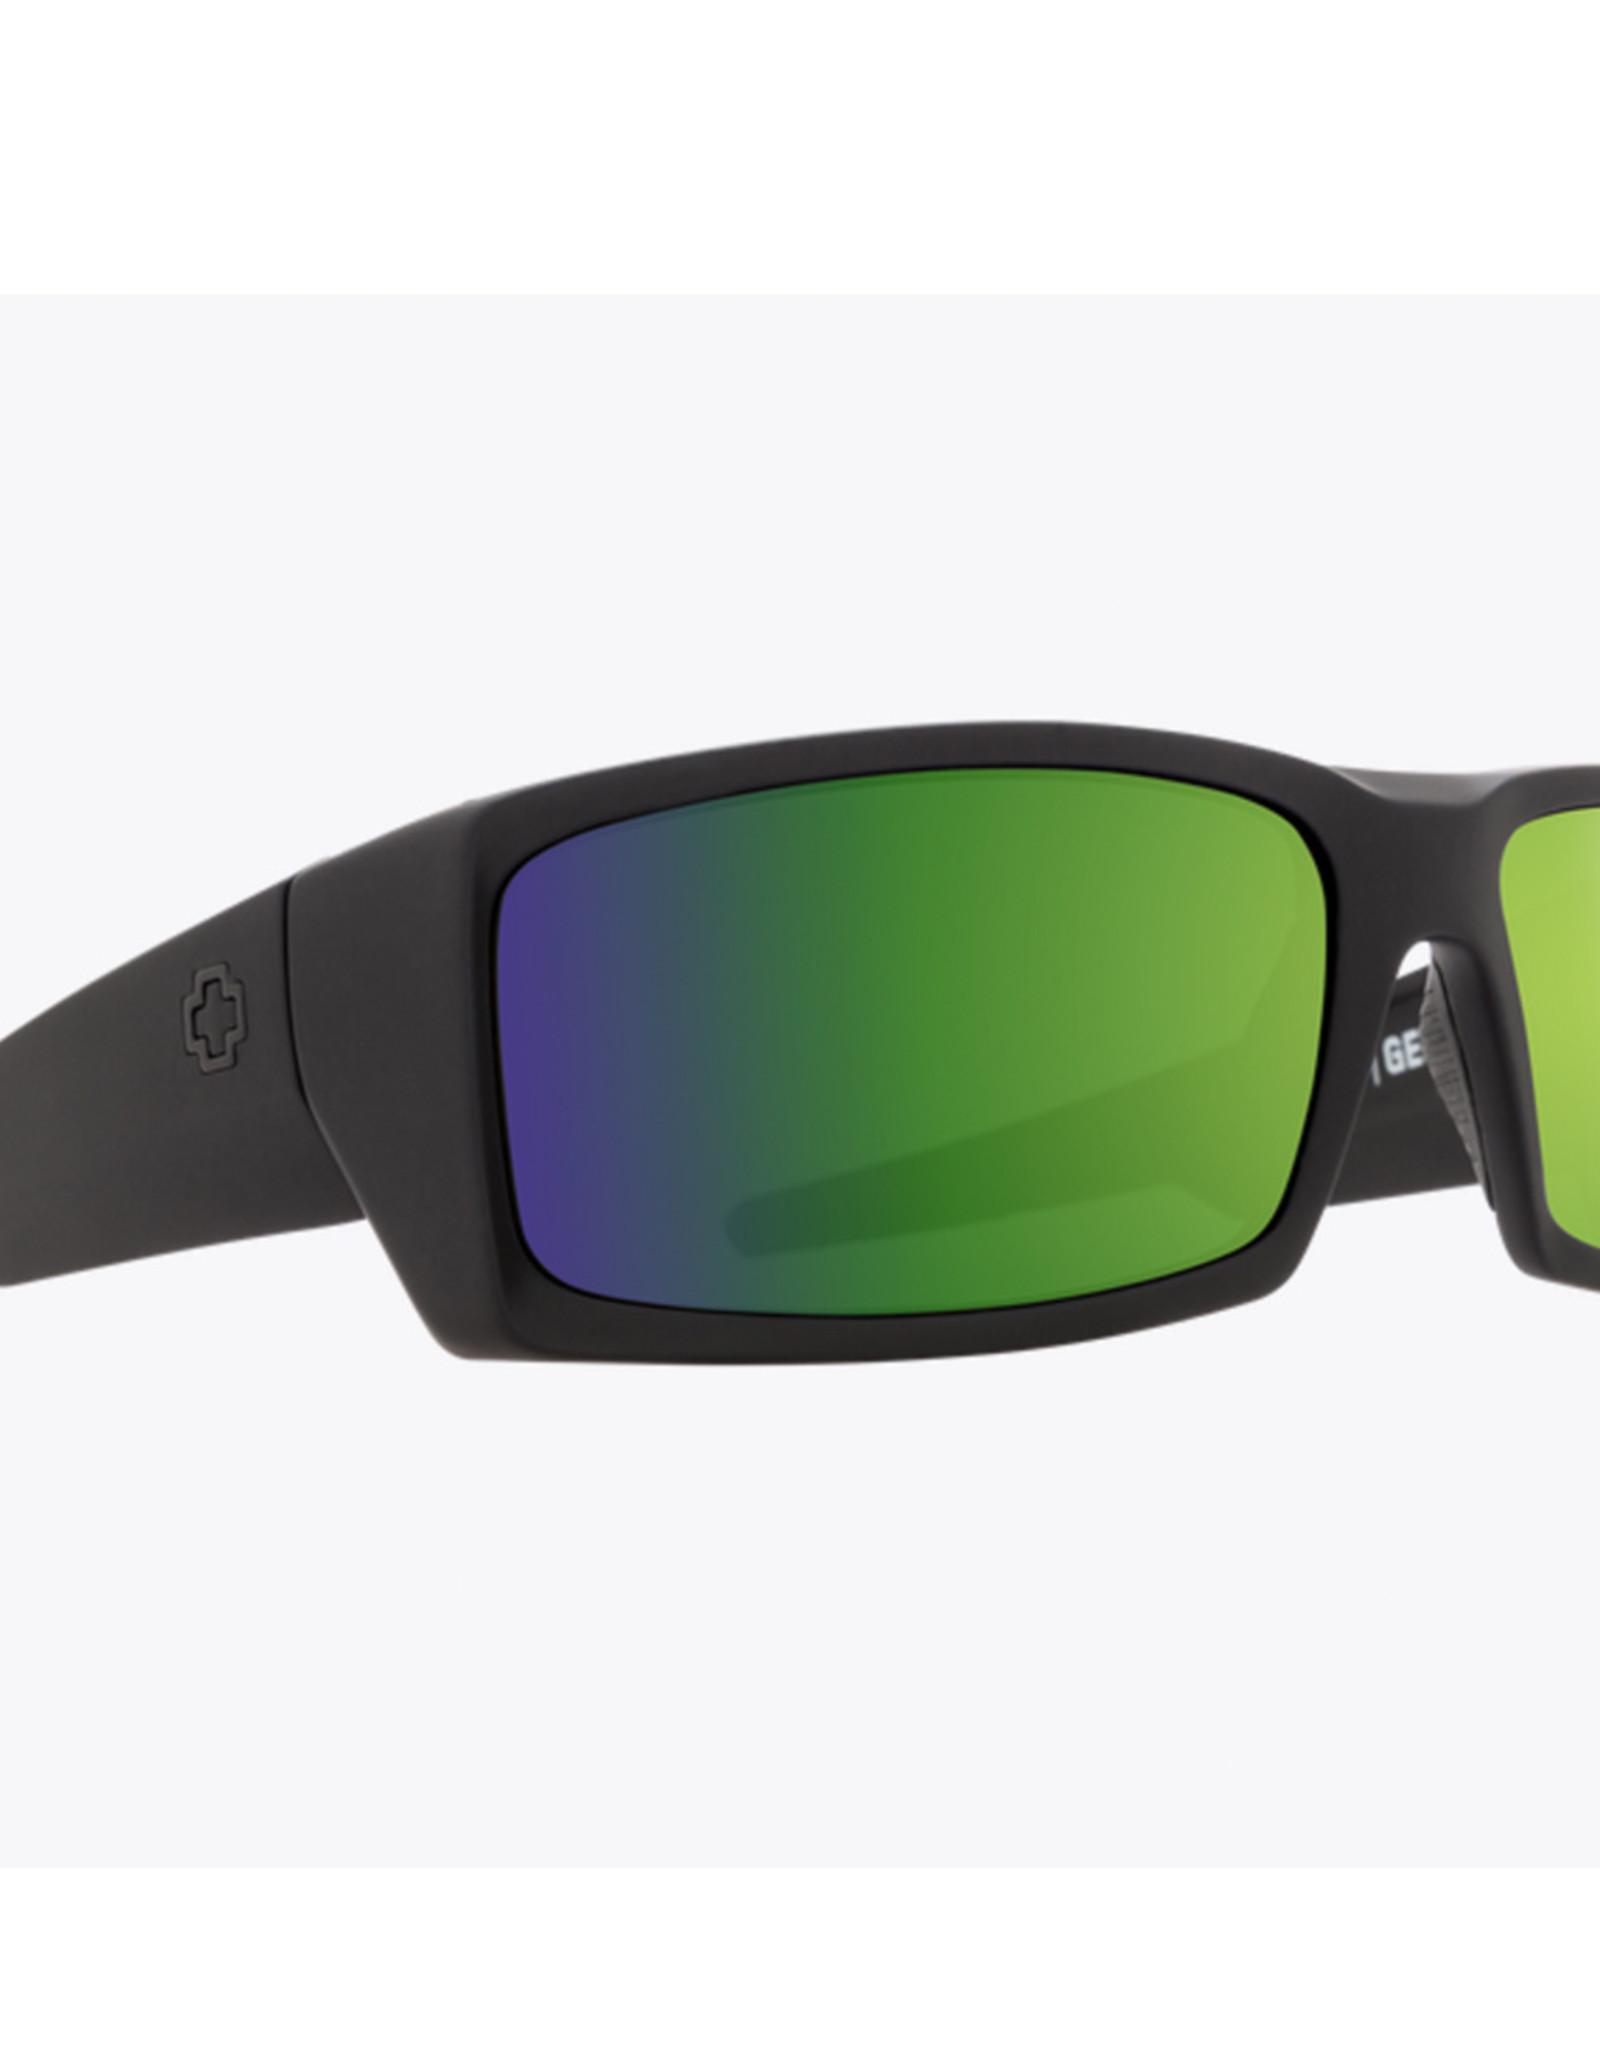 Spy General Soft Matte Black - Happy Bronze Polar With Green Spectra Mirror